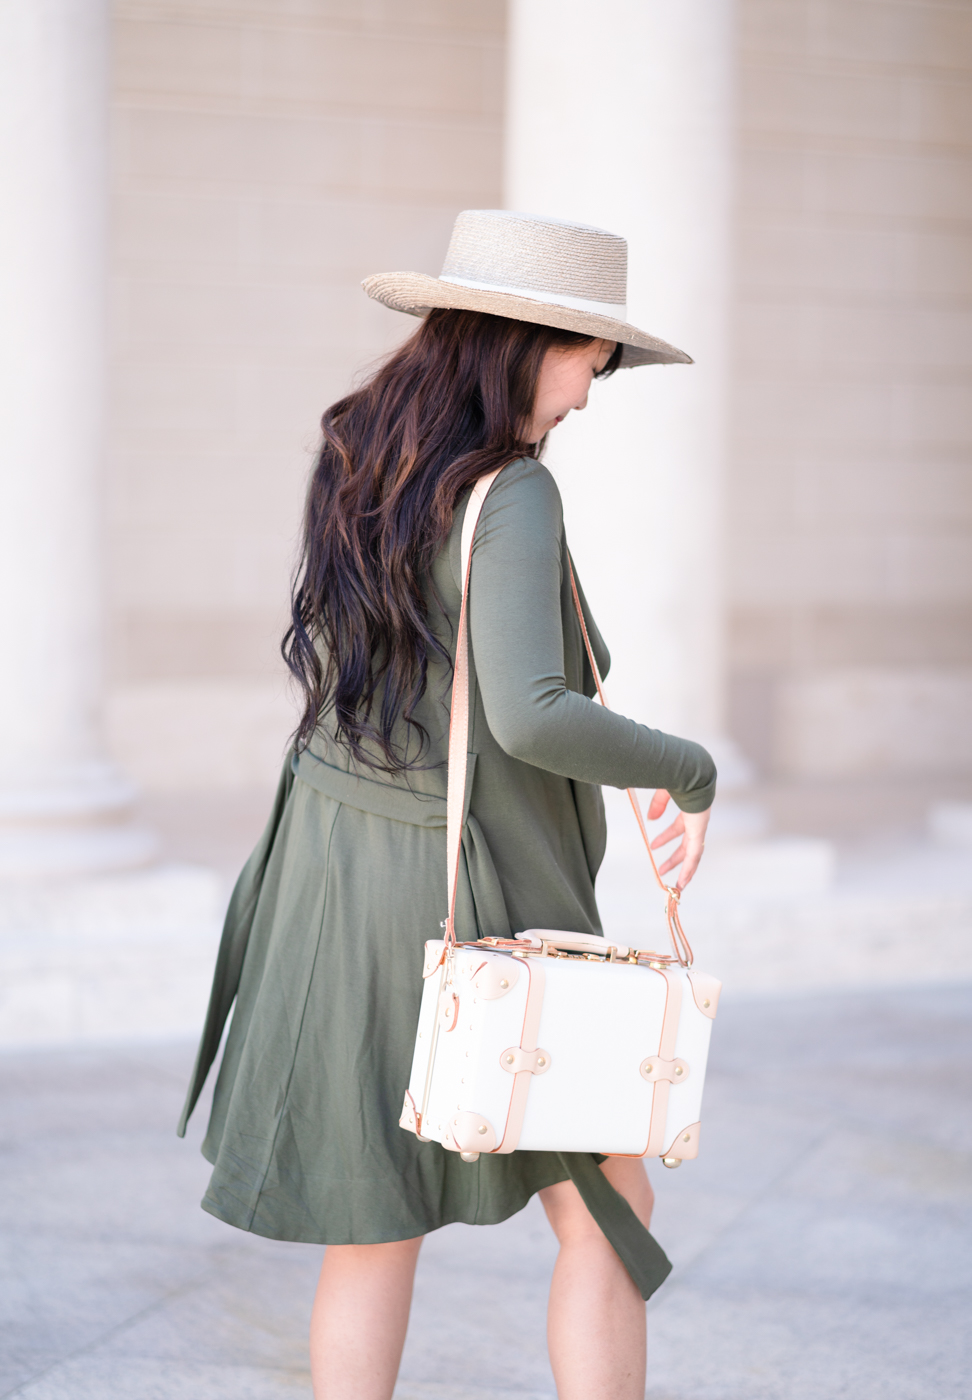 Sustianable Fashion | La Fille Colette Portmanteau Jacket | The Chic Diary